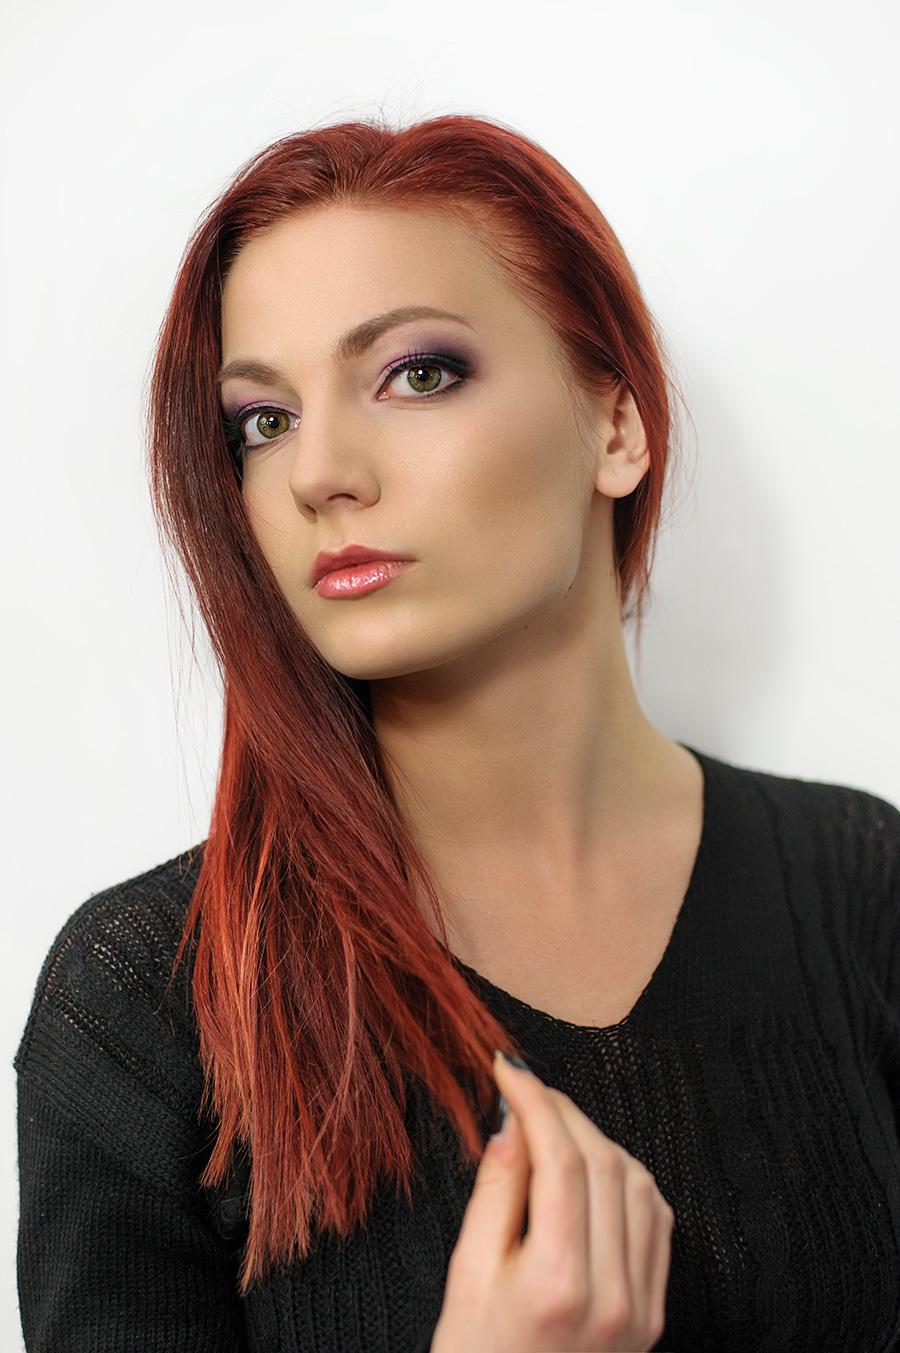 fotograf-portret-zhena